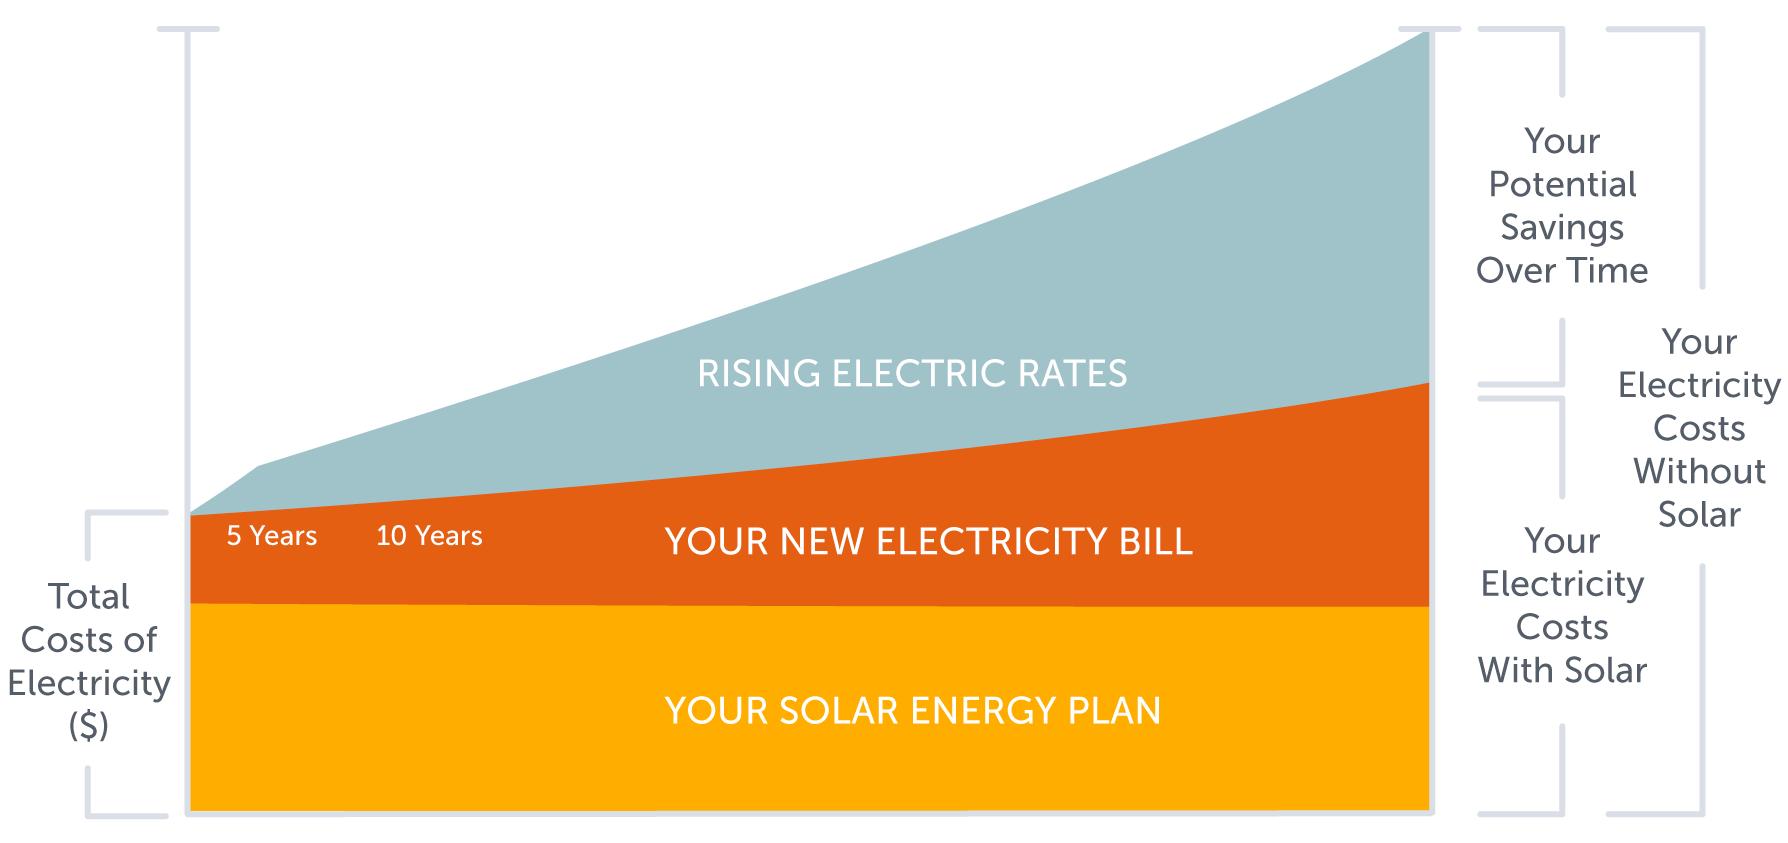 Sungevity Energy Saving Proposition Solar Planes Come